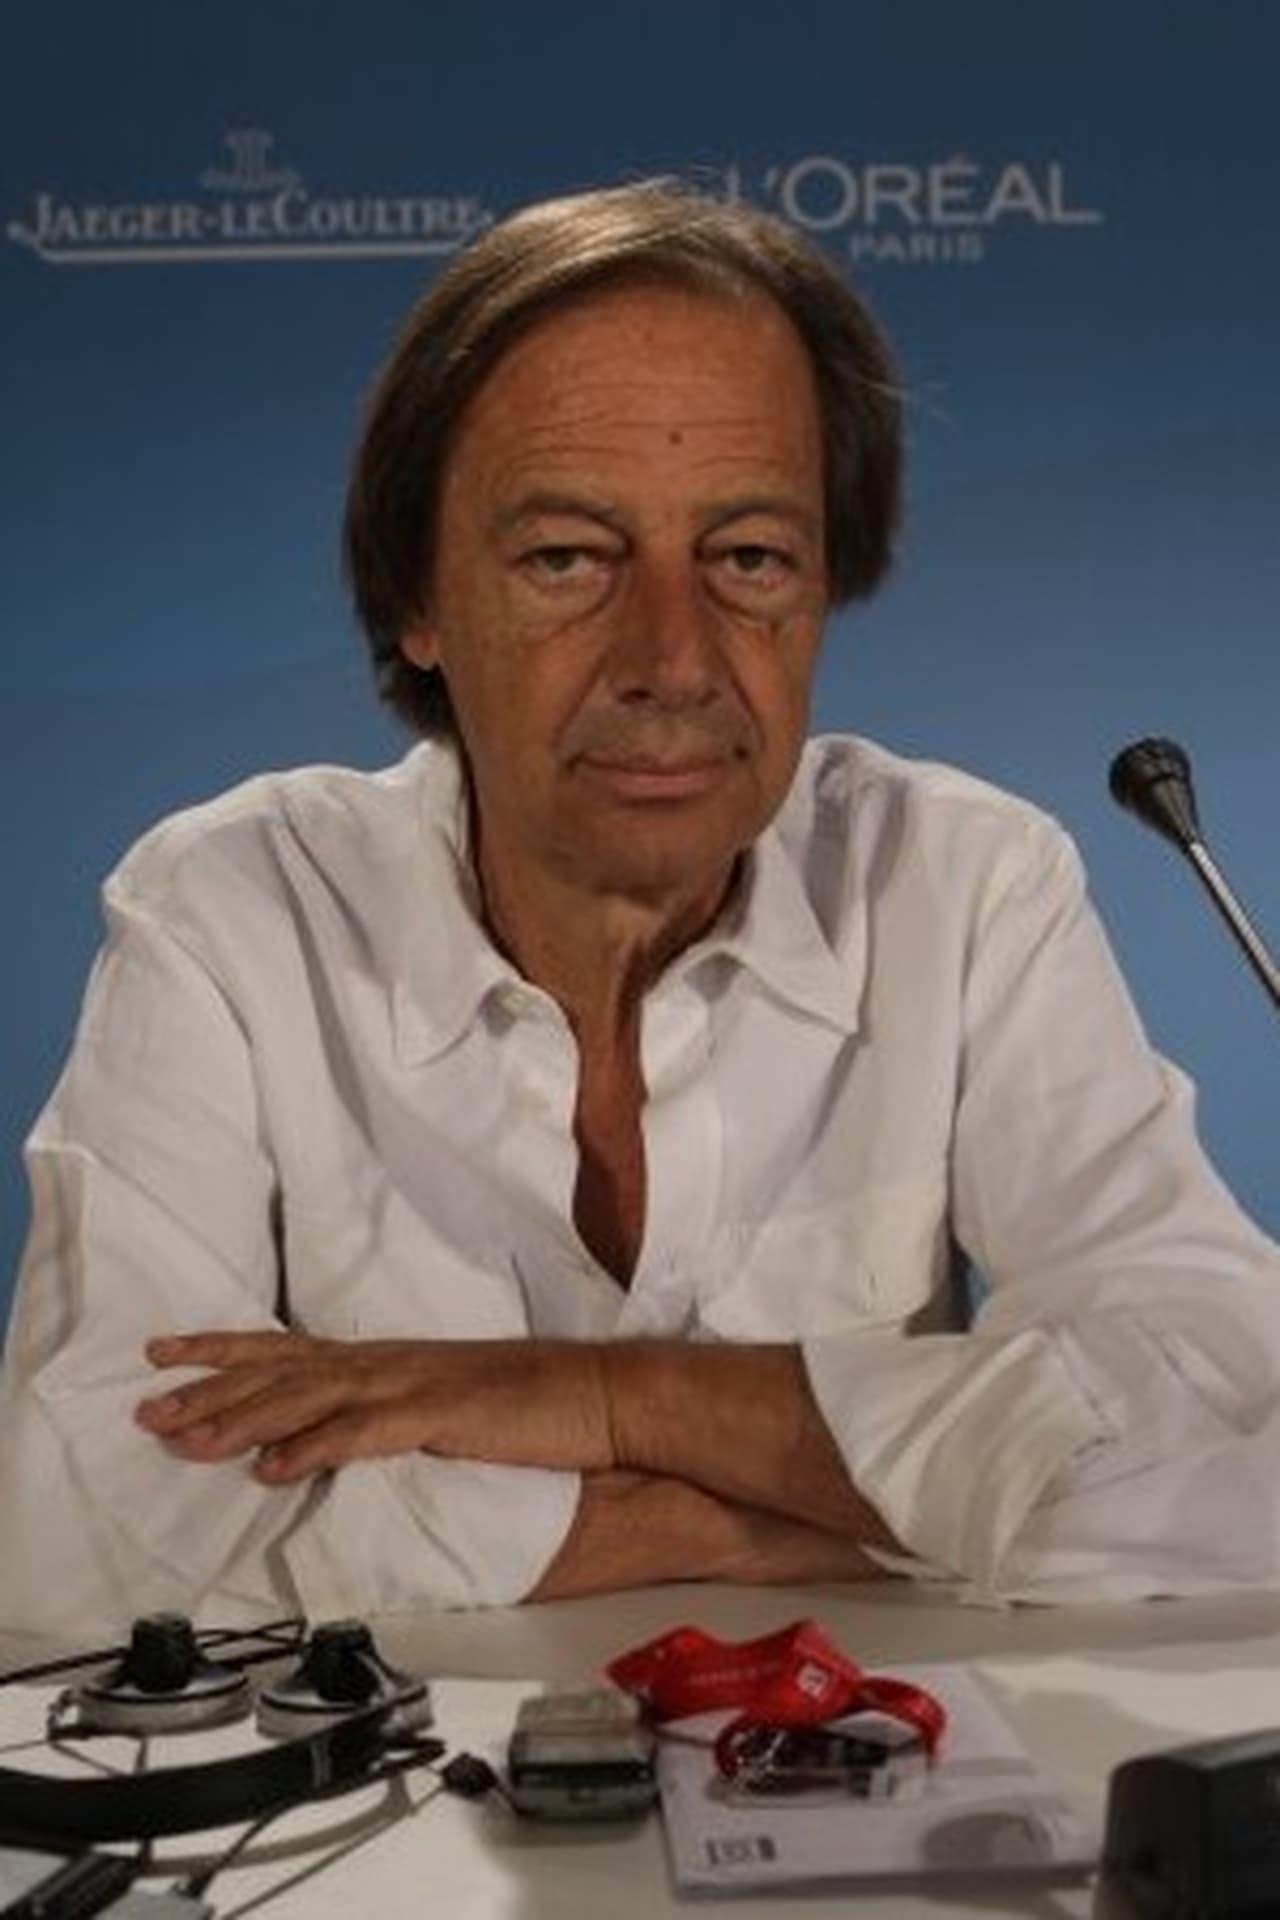 Amedeo Pagani